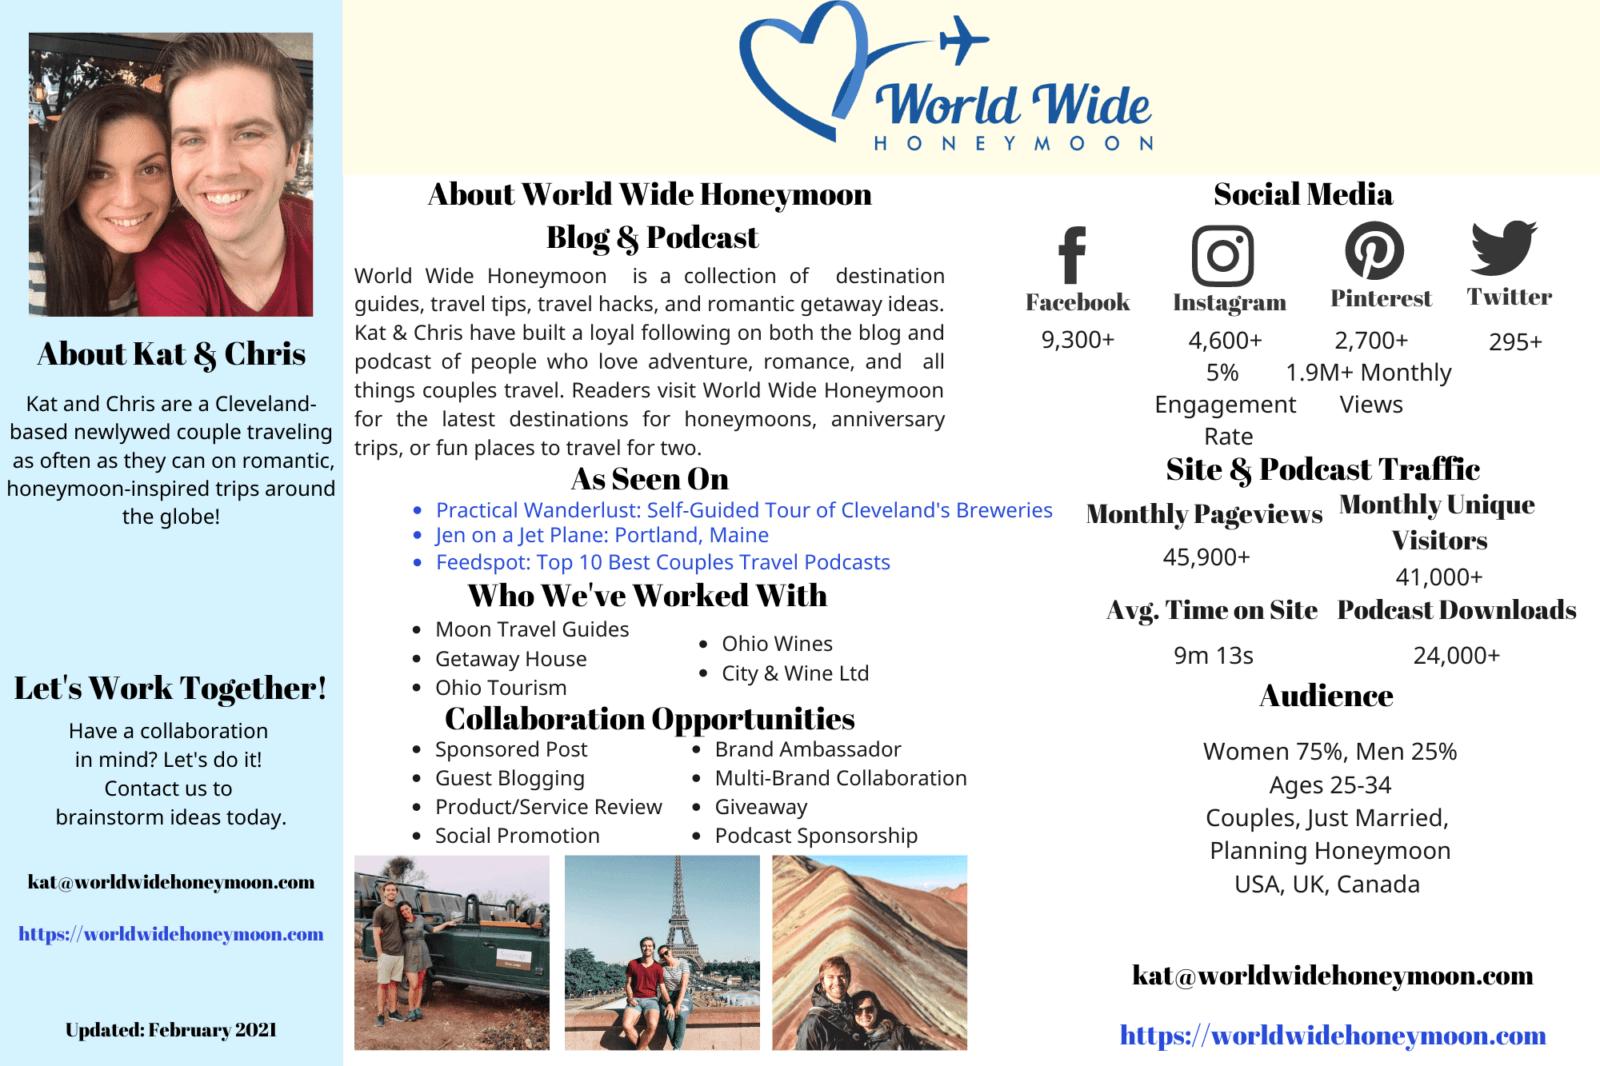 World Wide Honeymoon Media Kit (2) 2